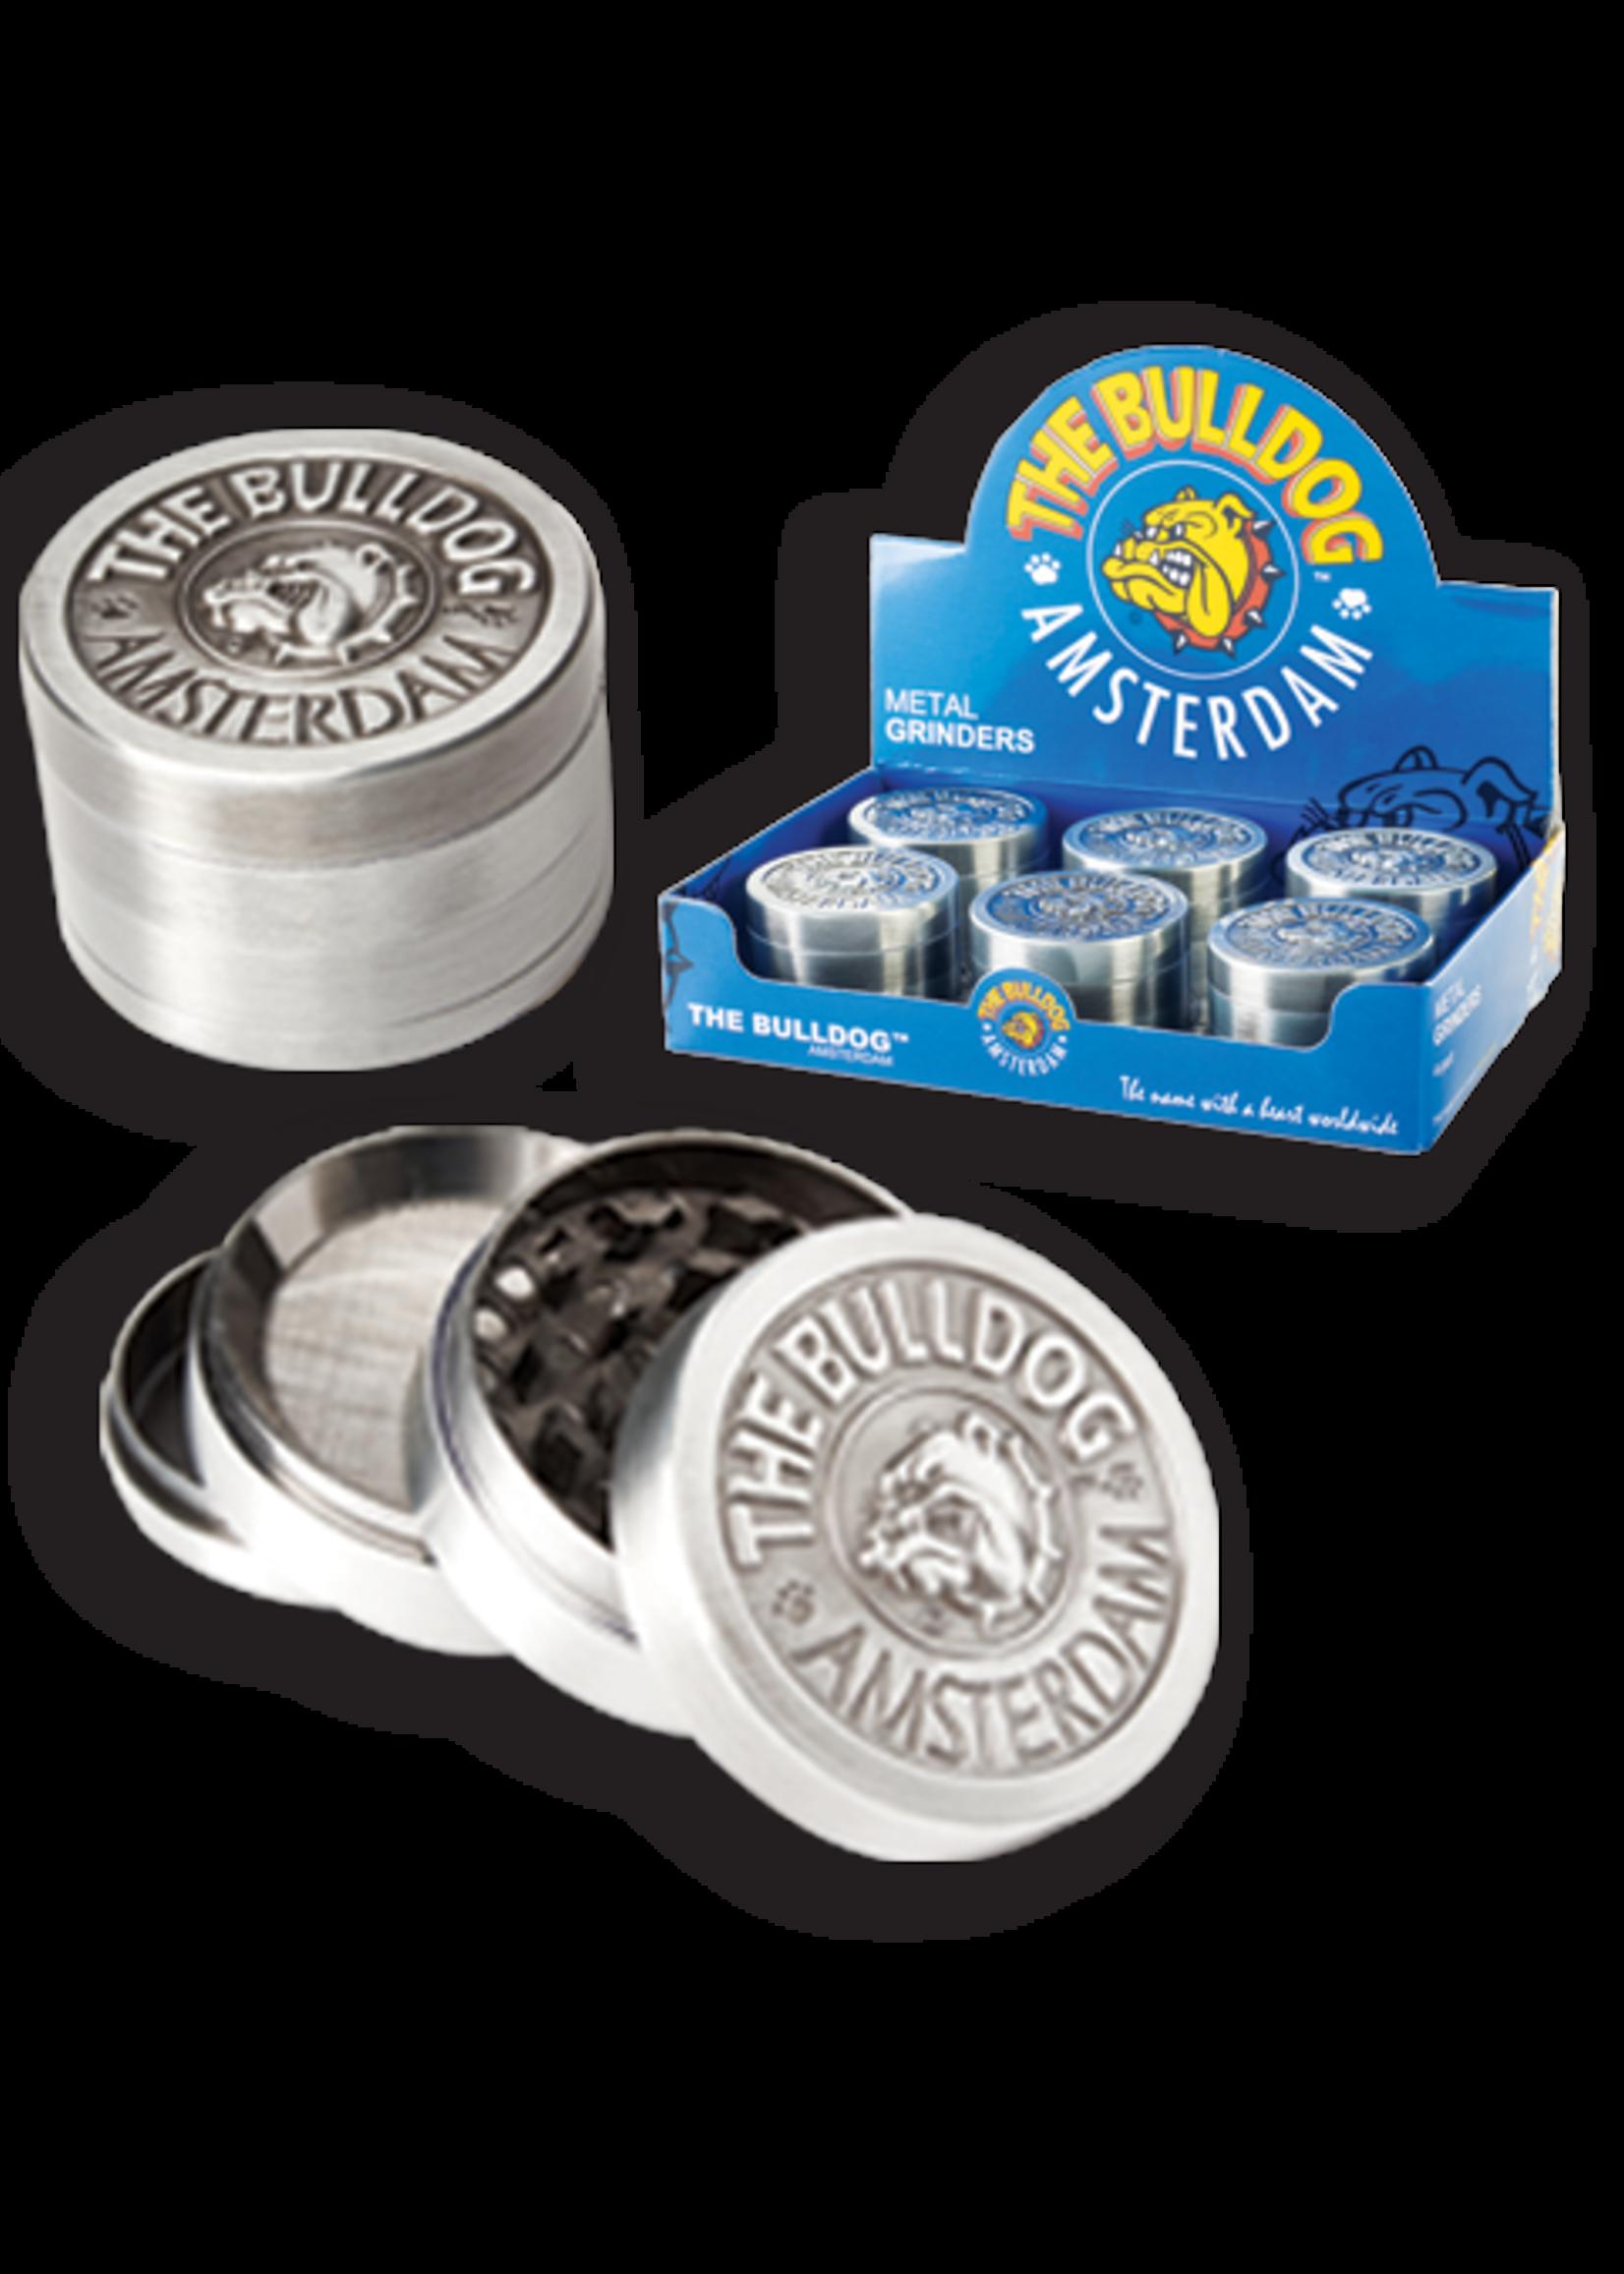 Herb grinder - The bulldog silver metal